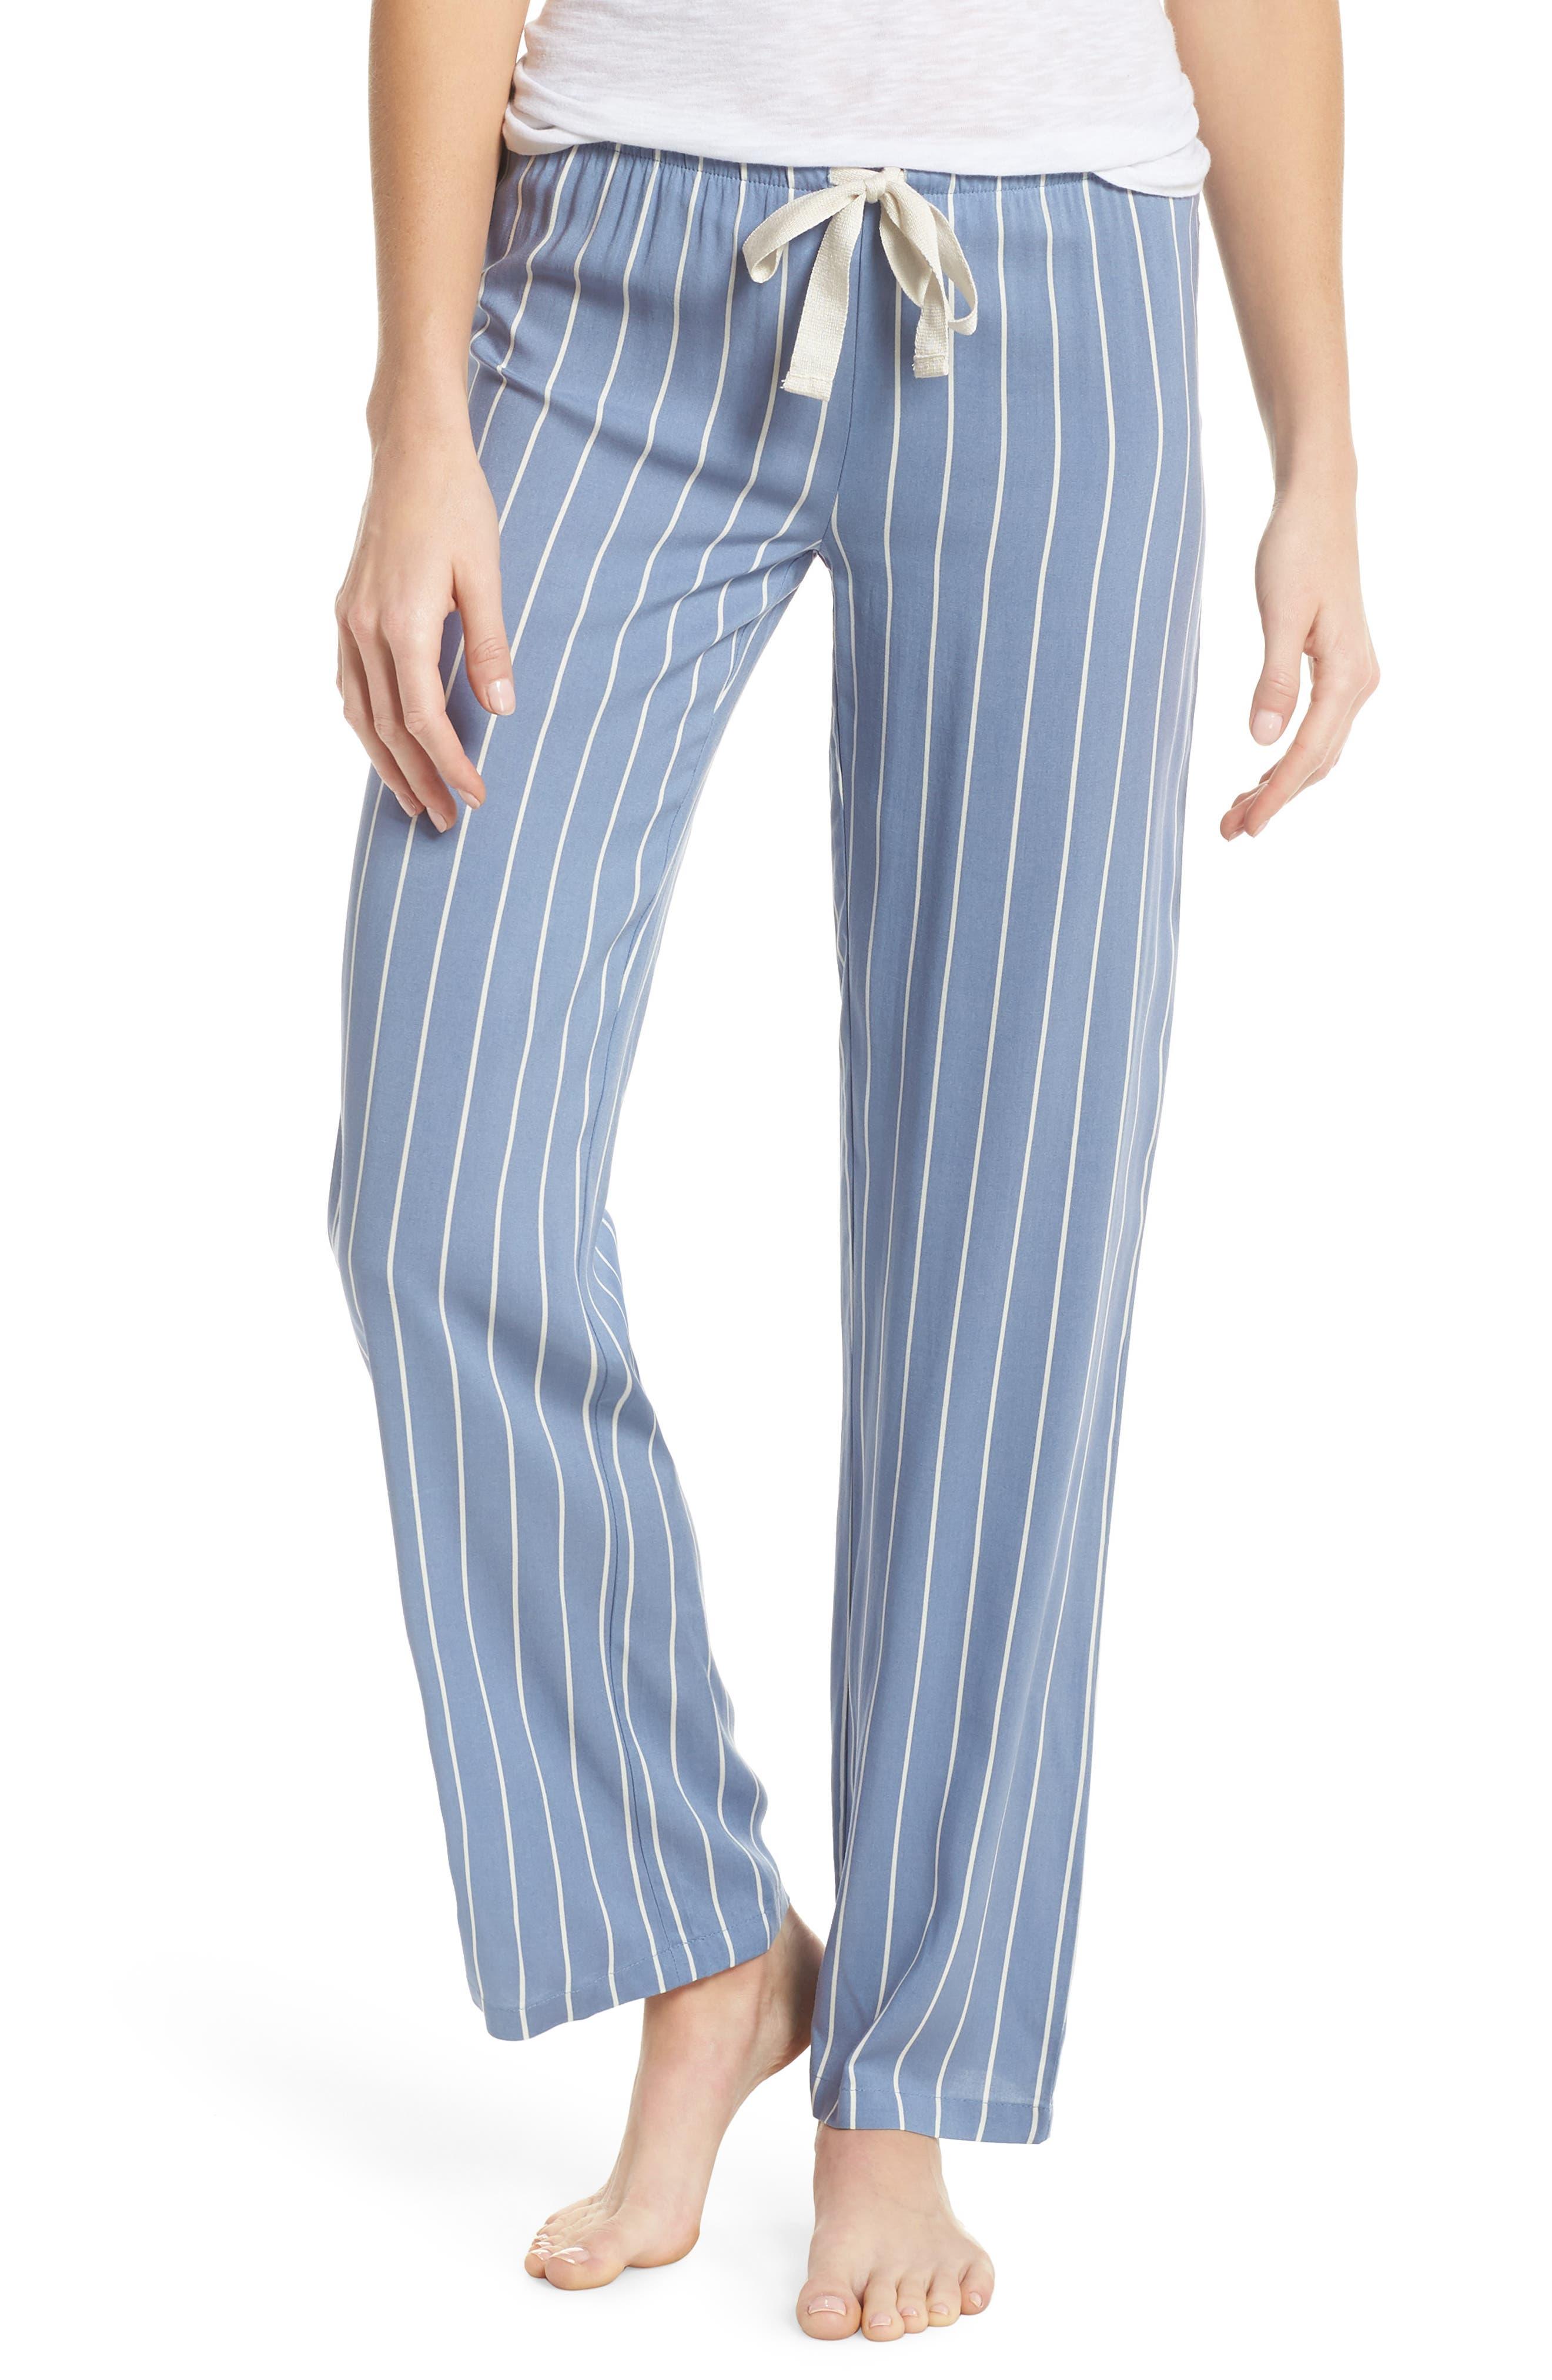 Joe's Wide Leg Pajama Pants